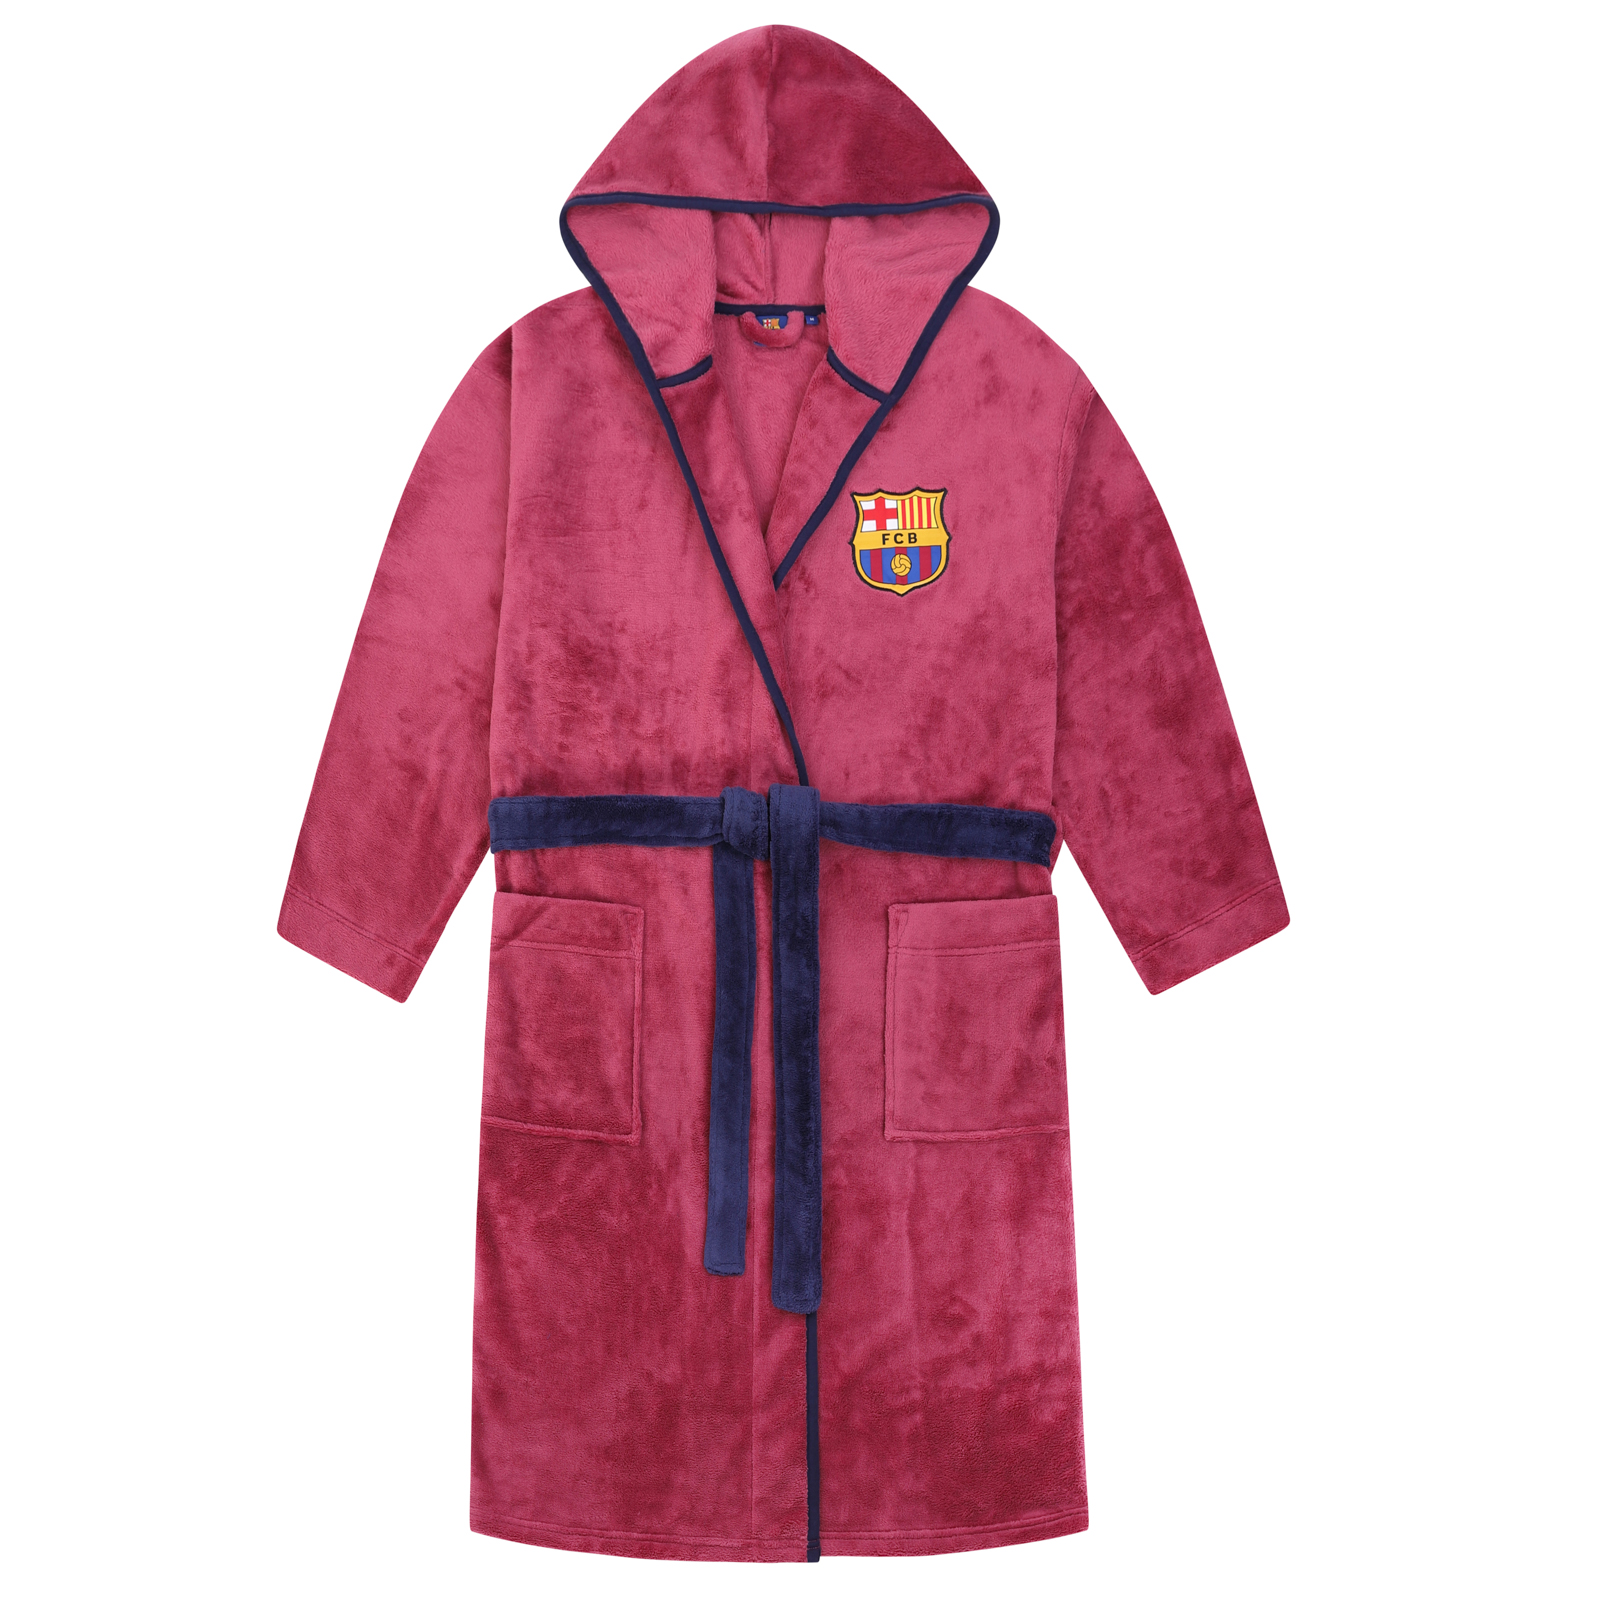 Tottenham Hotspur FC Official Gift Mens Hooded Fleece Dressing Gown Robe